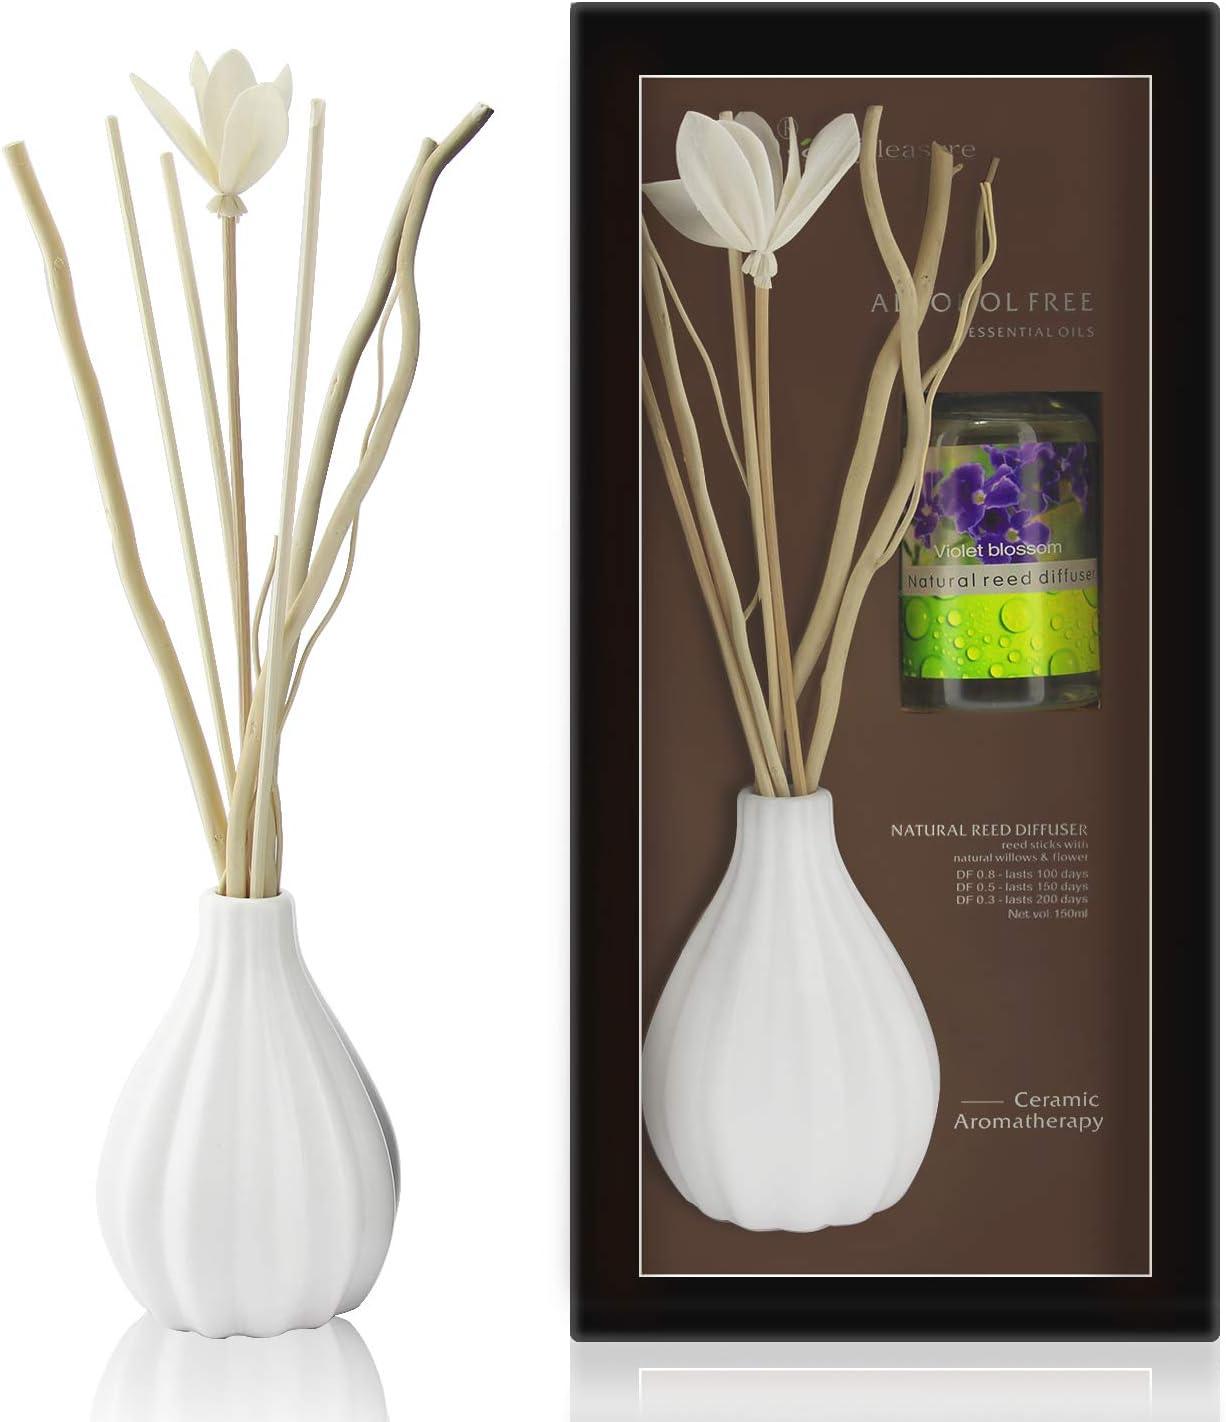 ap airpleasure Dried Flower Reed Diffuser Set, Natural Sticks, Elegant Ceramic Bottle, Aromatherapy Oil Set, Home Fragrance & Decorative Diffuser (VioletBlossom)